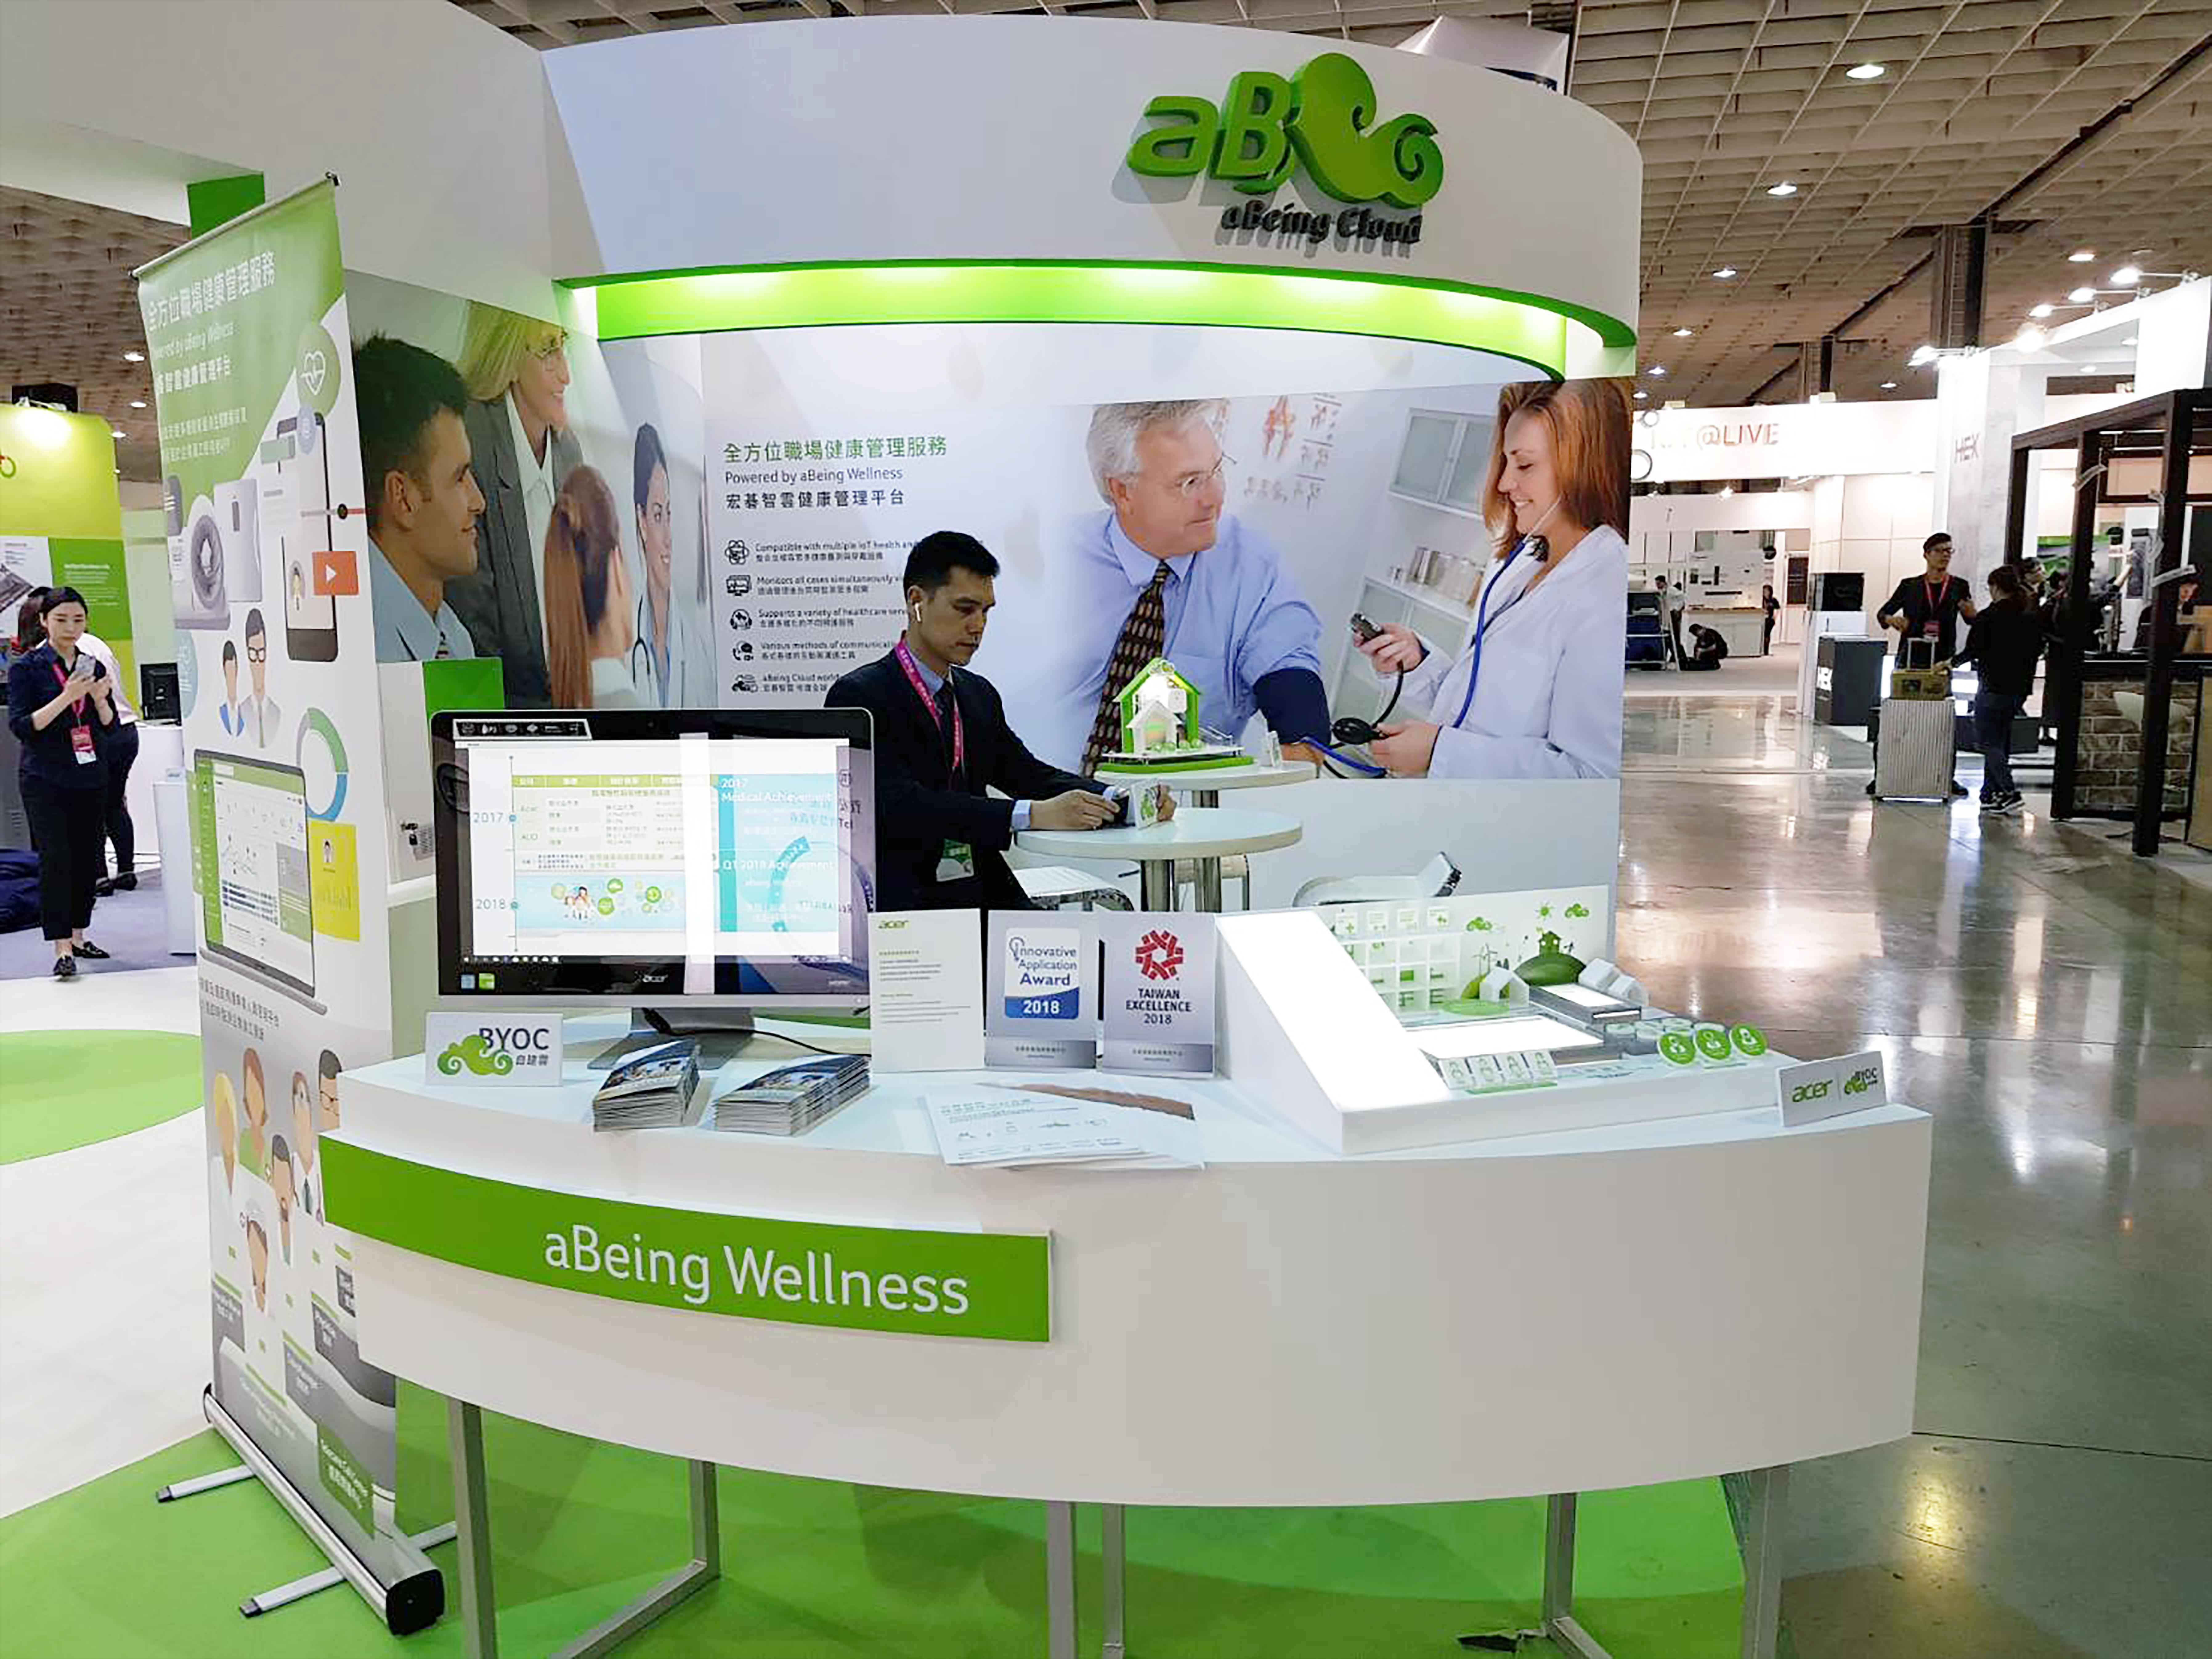 aBeing Wellness宏碁智雲健康管理平台於2018智慧城市展展出,圖為施宣輝董事長蒞臨展覽欣賞